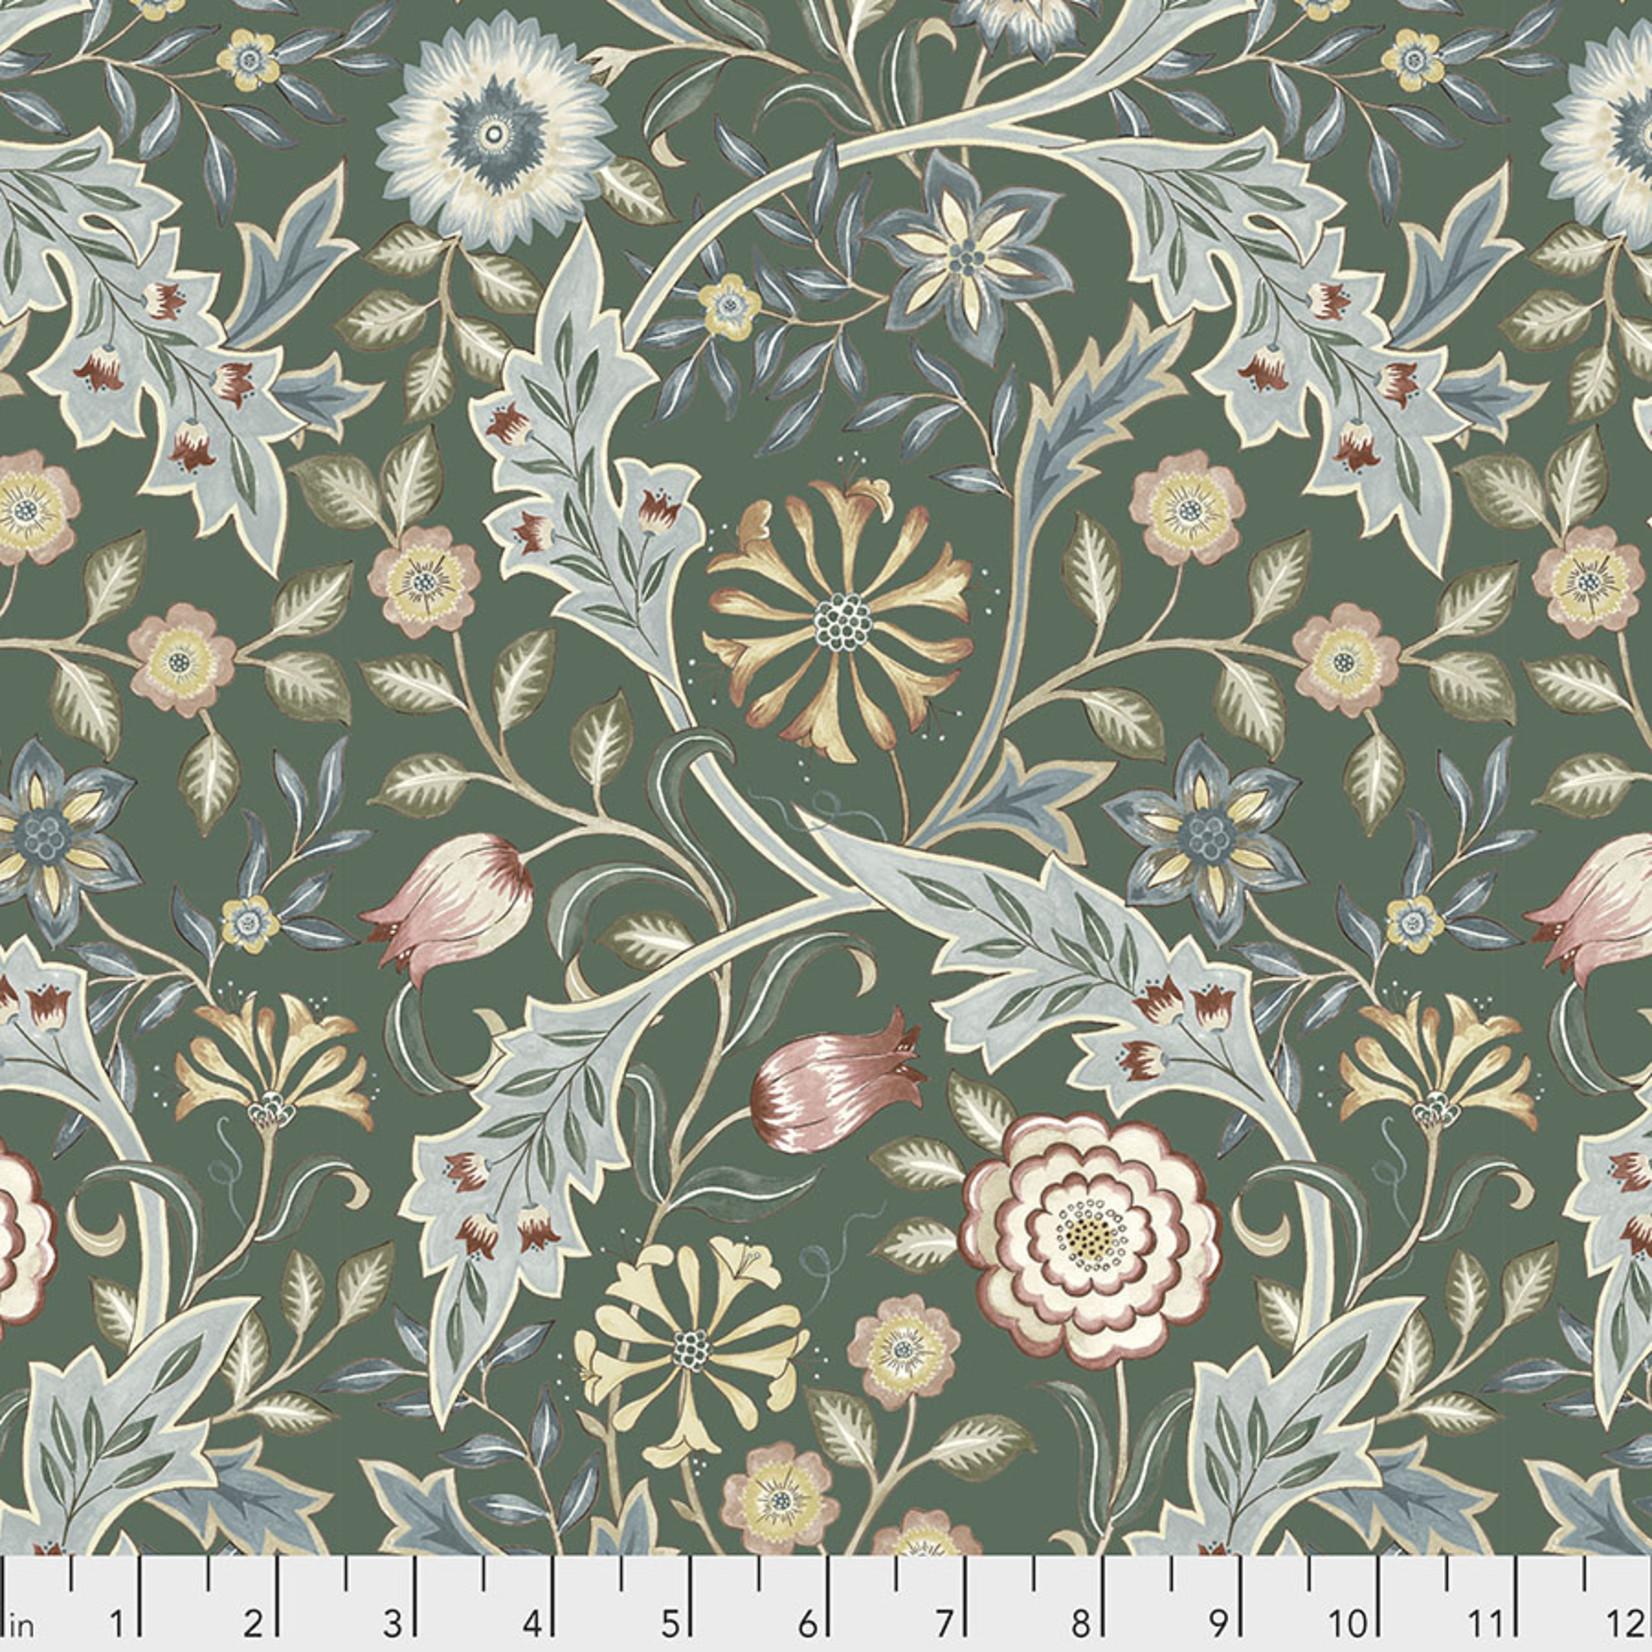 Morris & Co Orkney, Wilhemina - Sage (PWWM049) per cm or $16/m